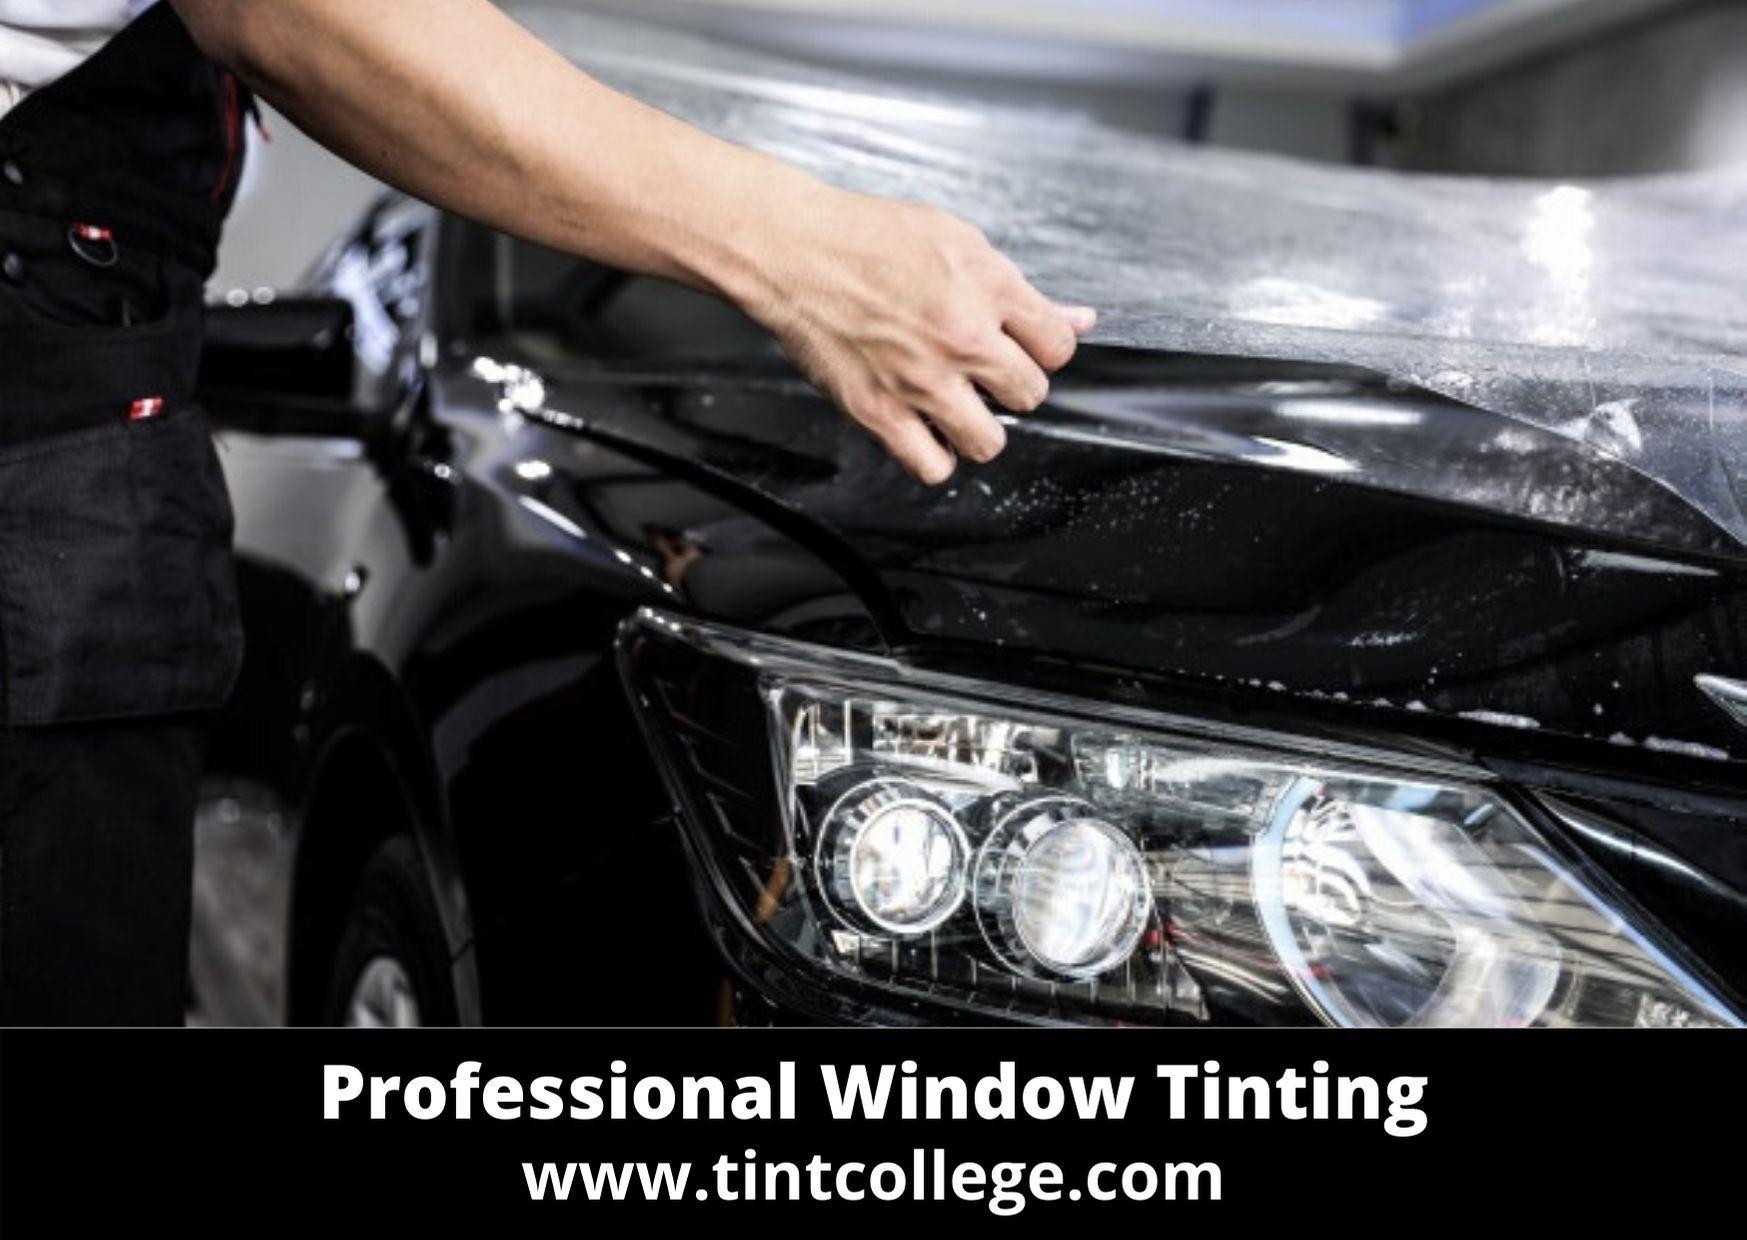 Professional Window Tinting Tint College Tinted Windows Tinted House Windows Tints